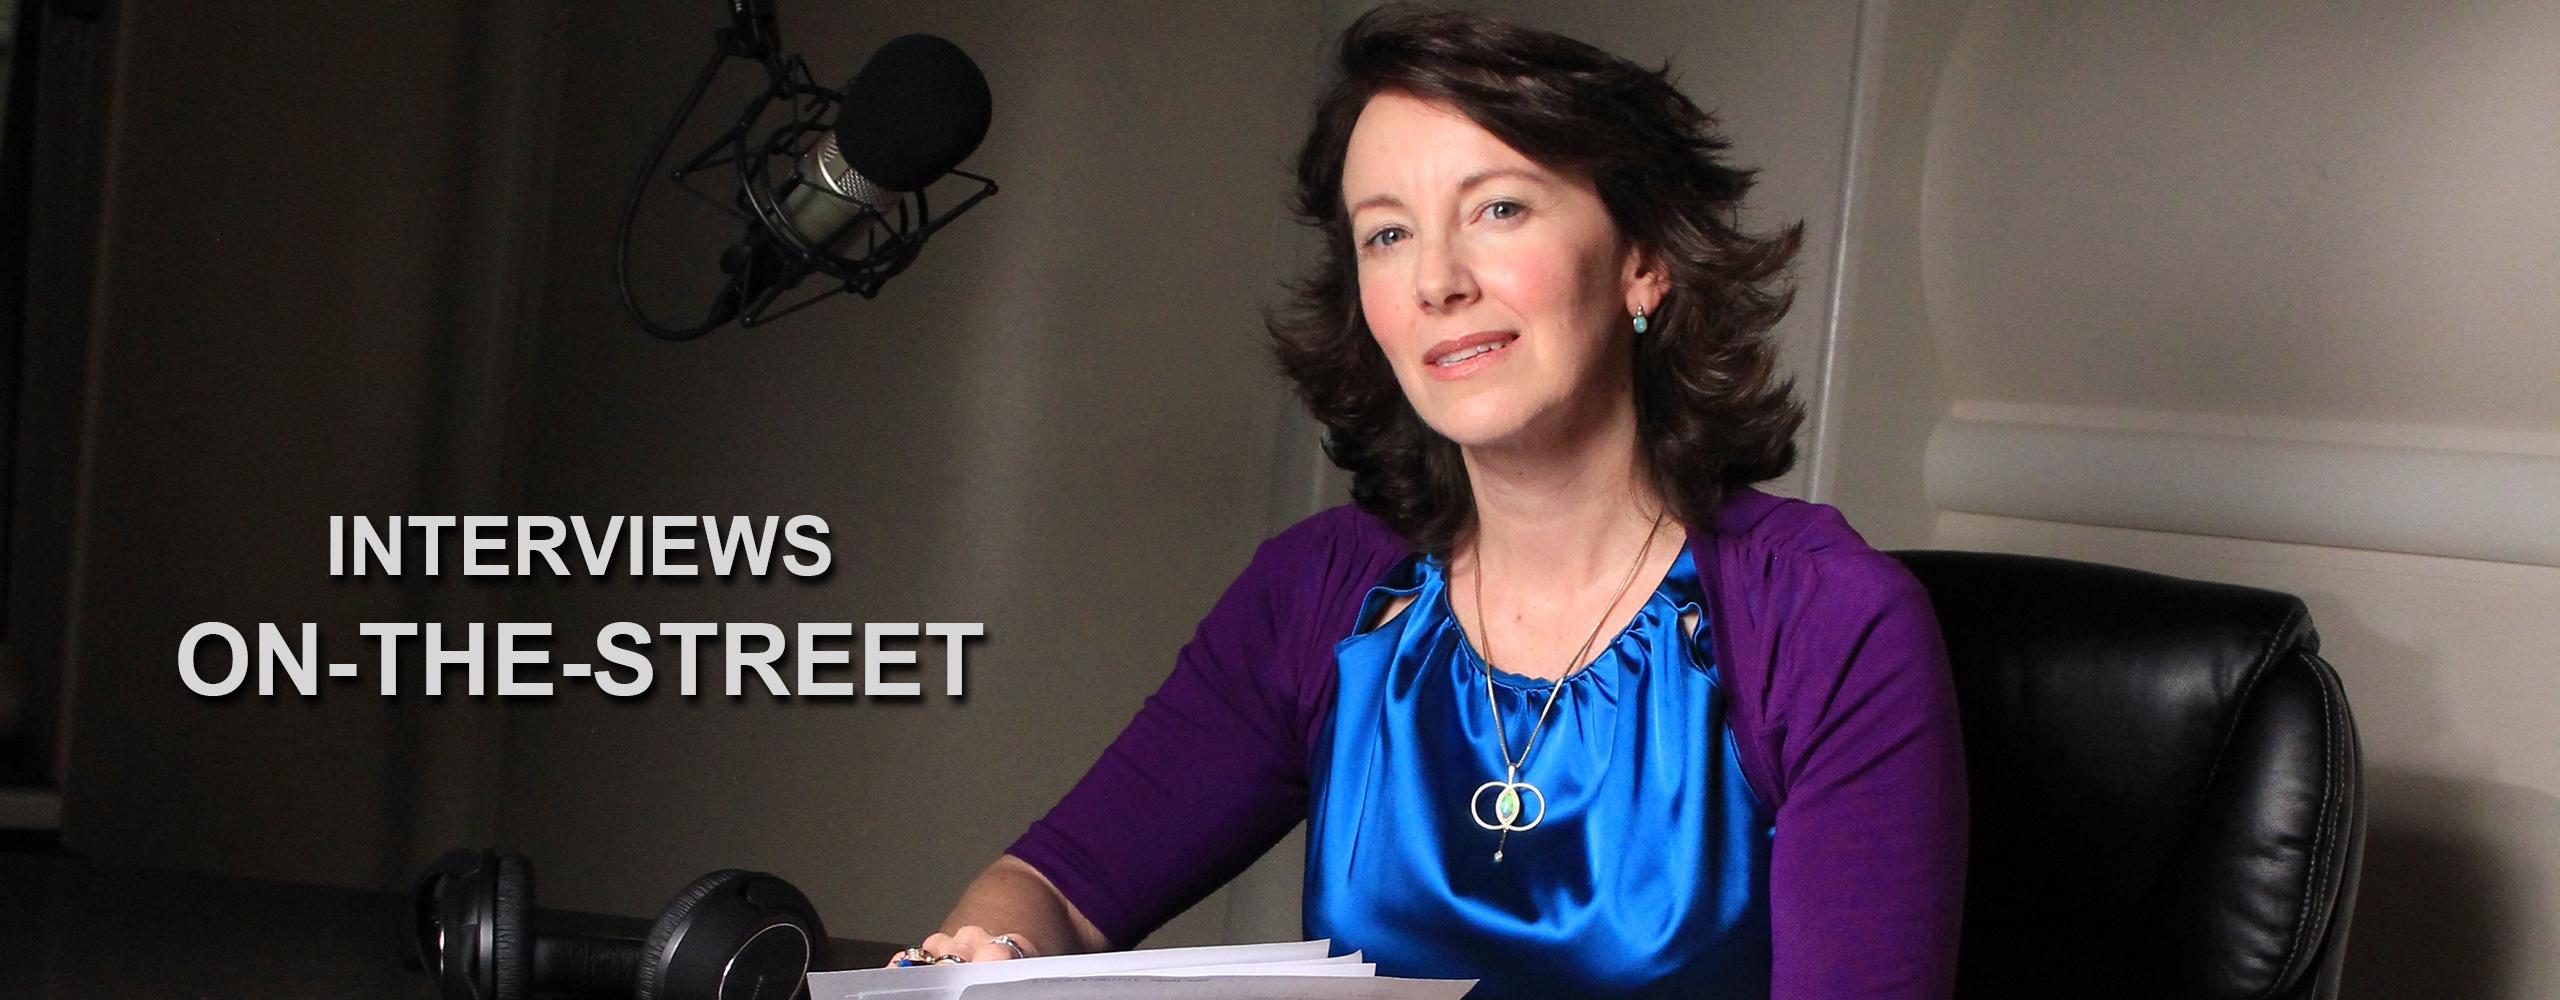 Interviews On-the-Street